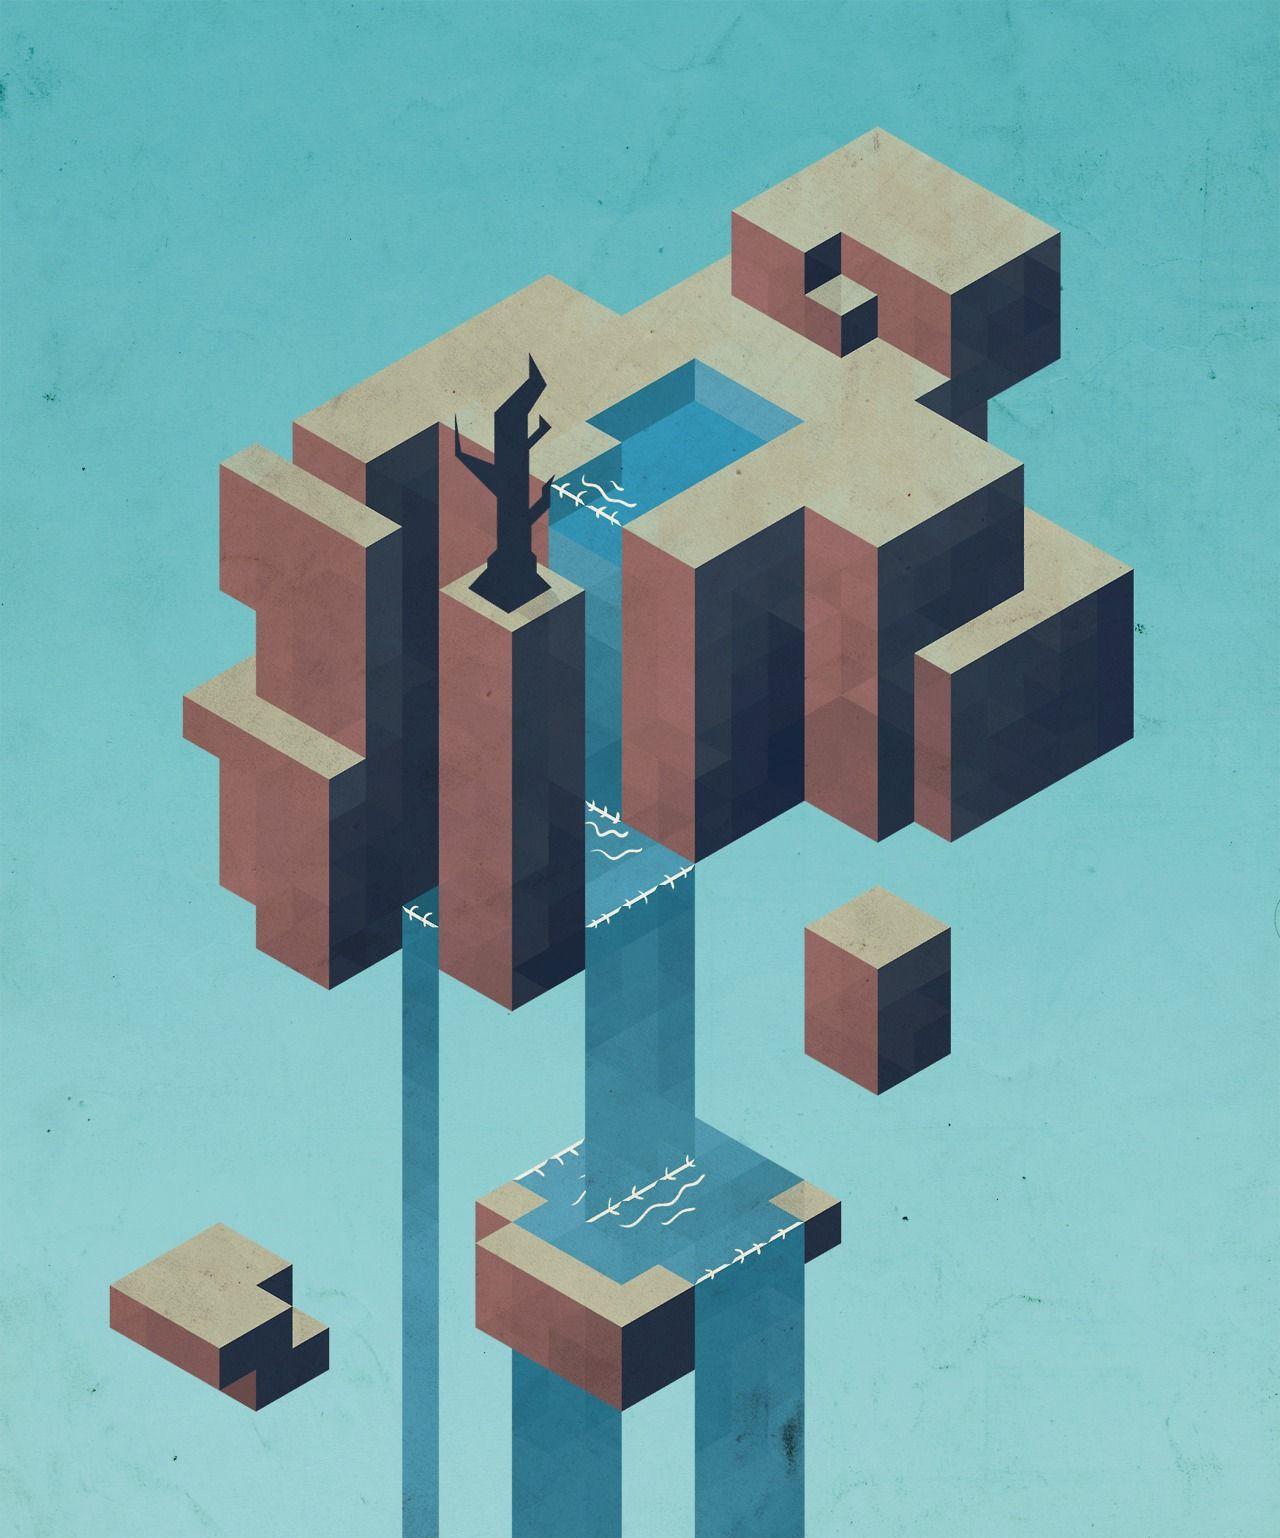 marmoset hexels alternative